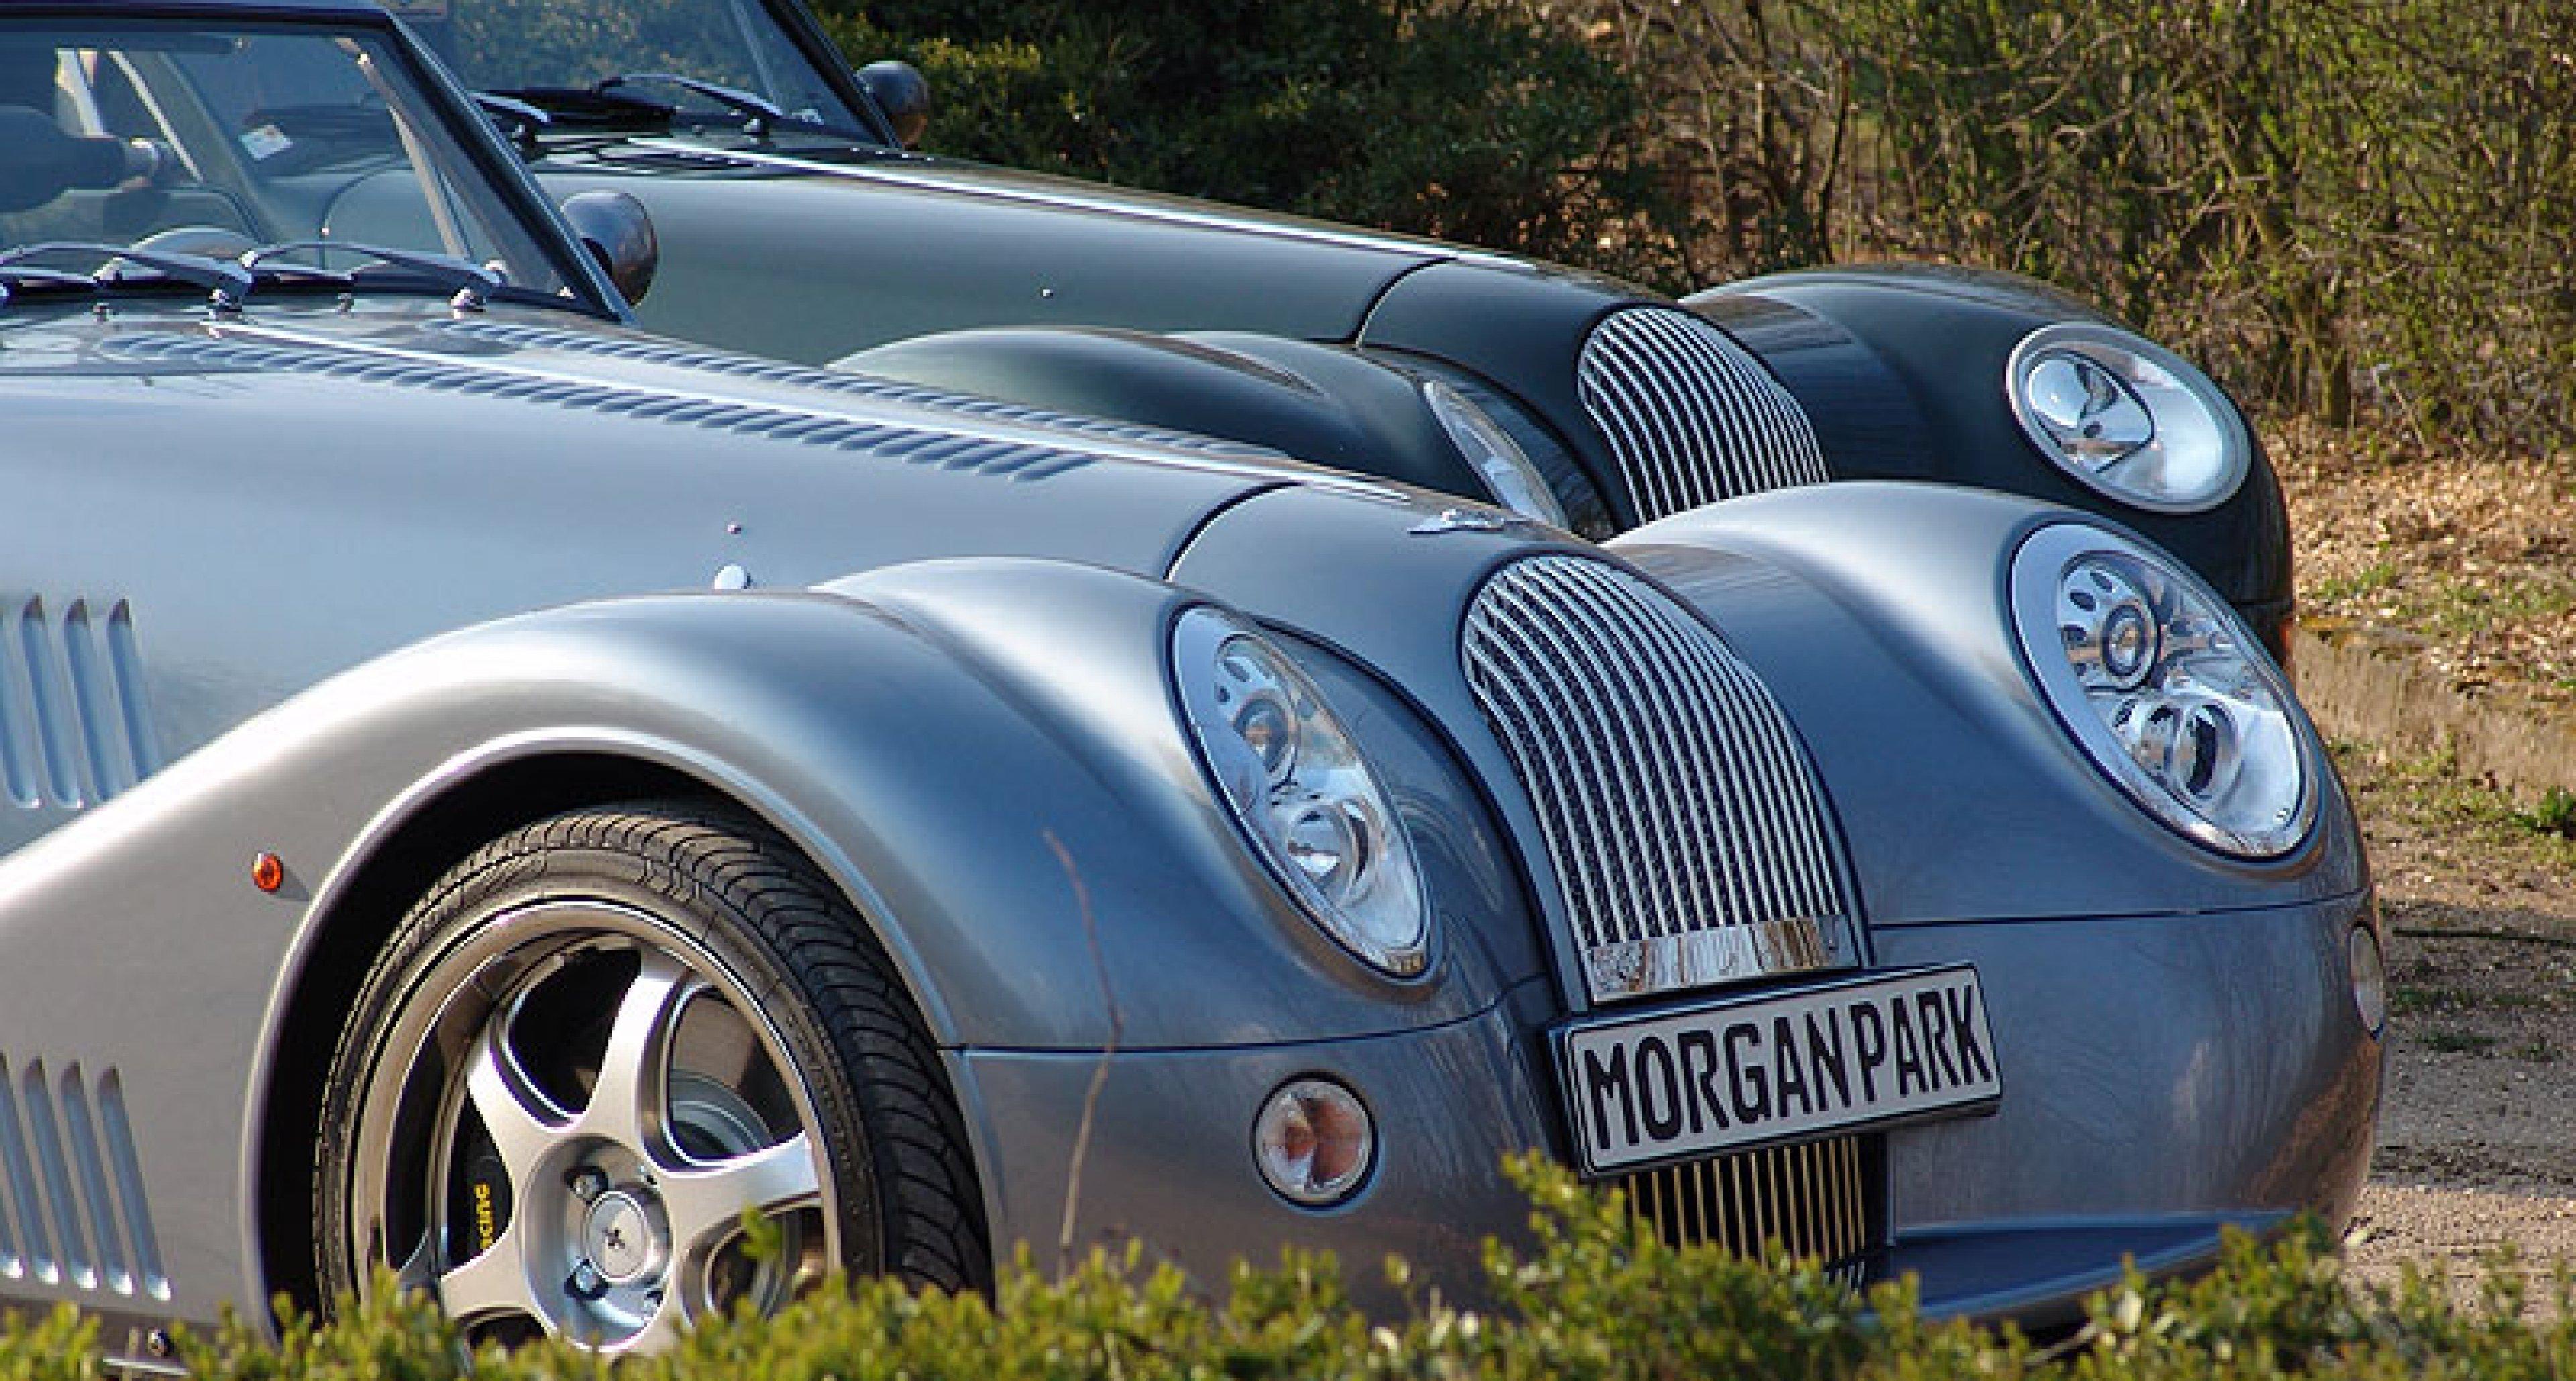 Morgan Aero 8 Development Car vs. Morgan Aero 8 Mk III